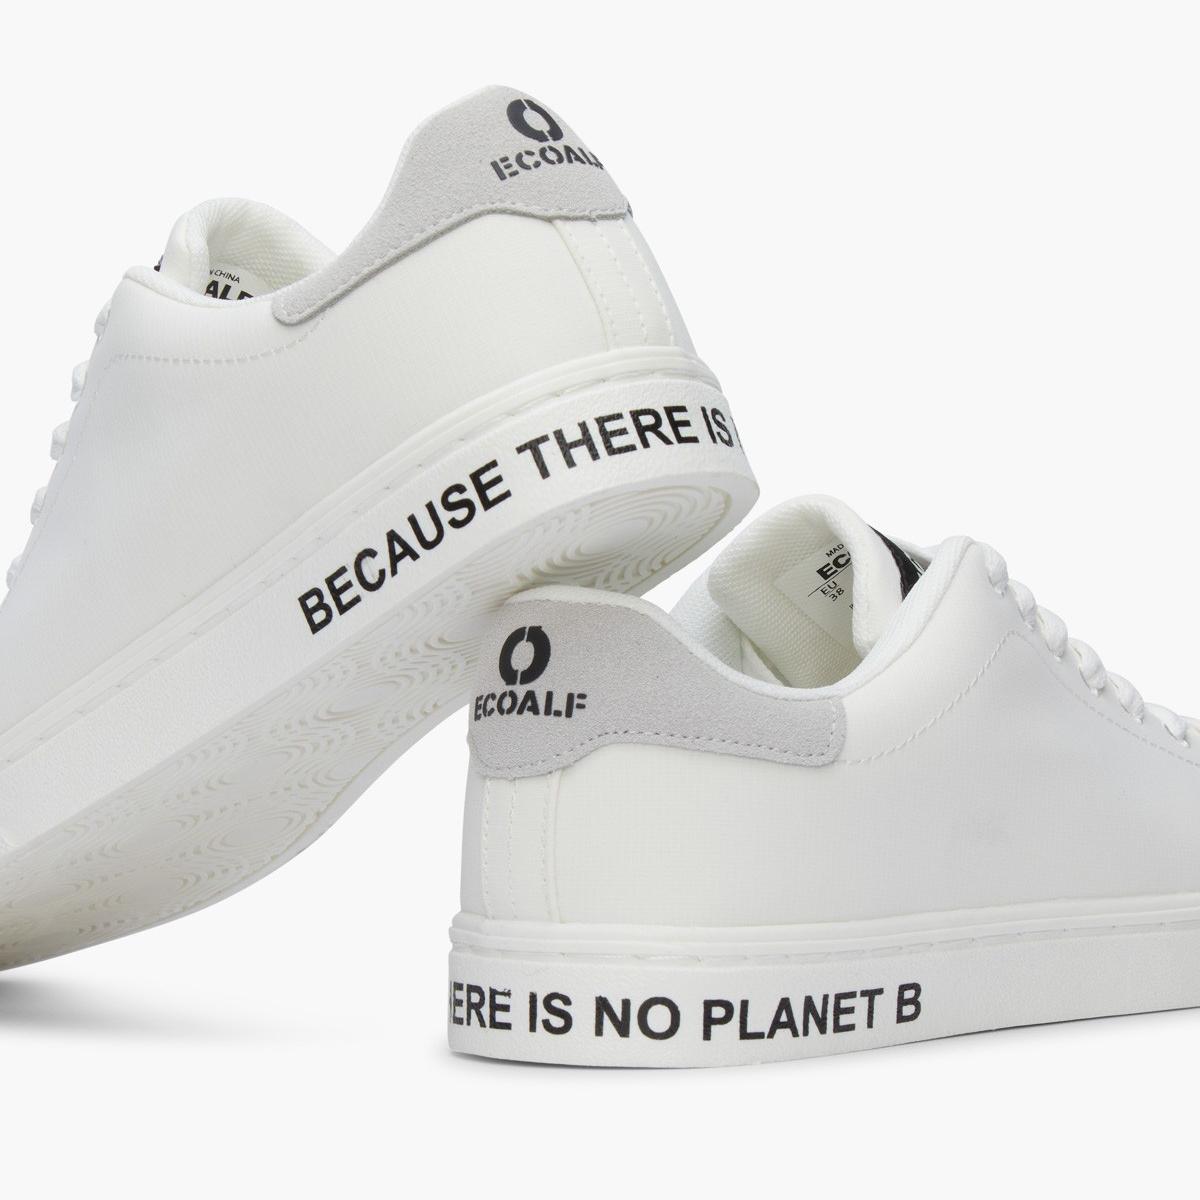 Packshot of Ecoalf Sandford Sneakers